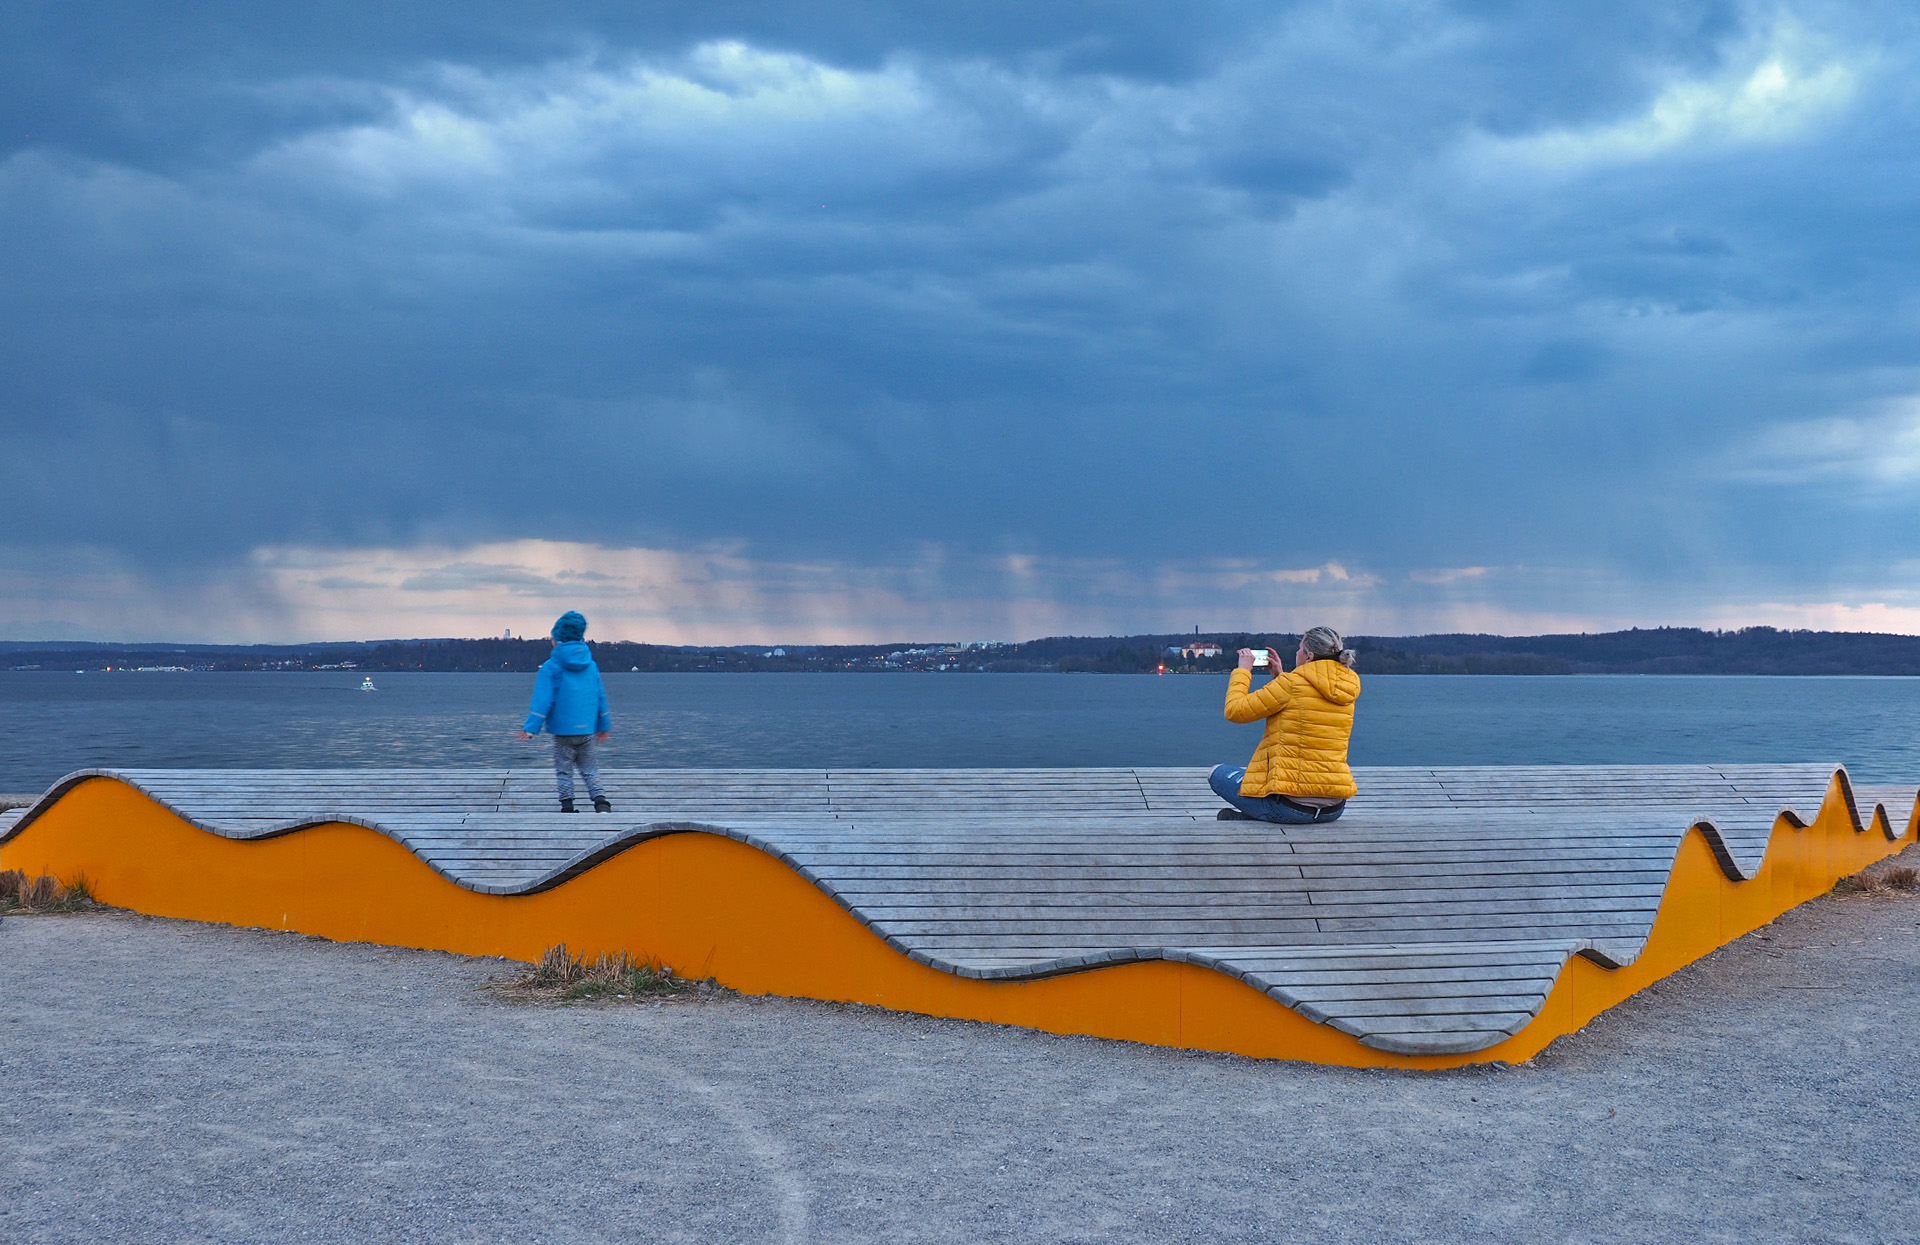 Sturmwarnung Foto:Bernhard Waurick